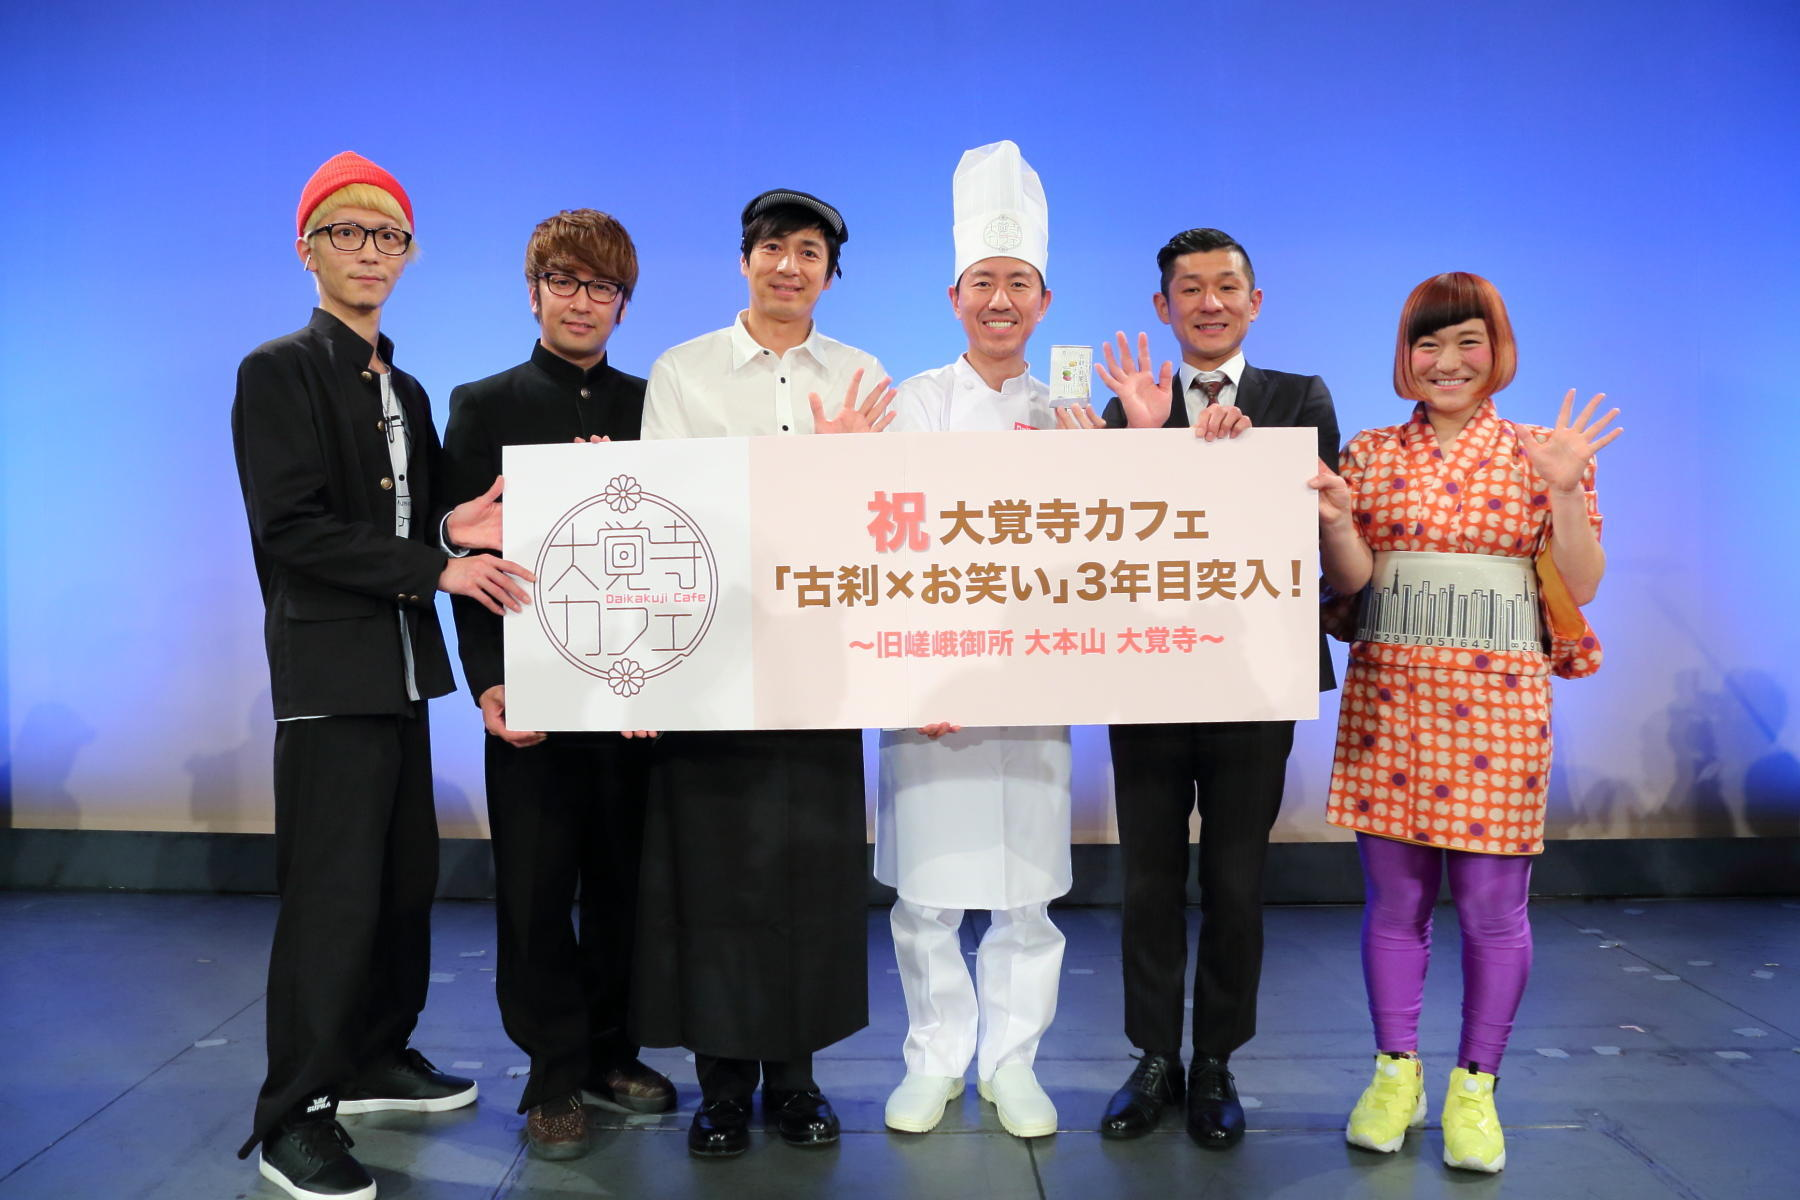 http://news.yoshimoto.co.jp/20170316061742-1c2227f90063553251f482096718e792bffaad23.jpg